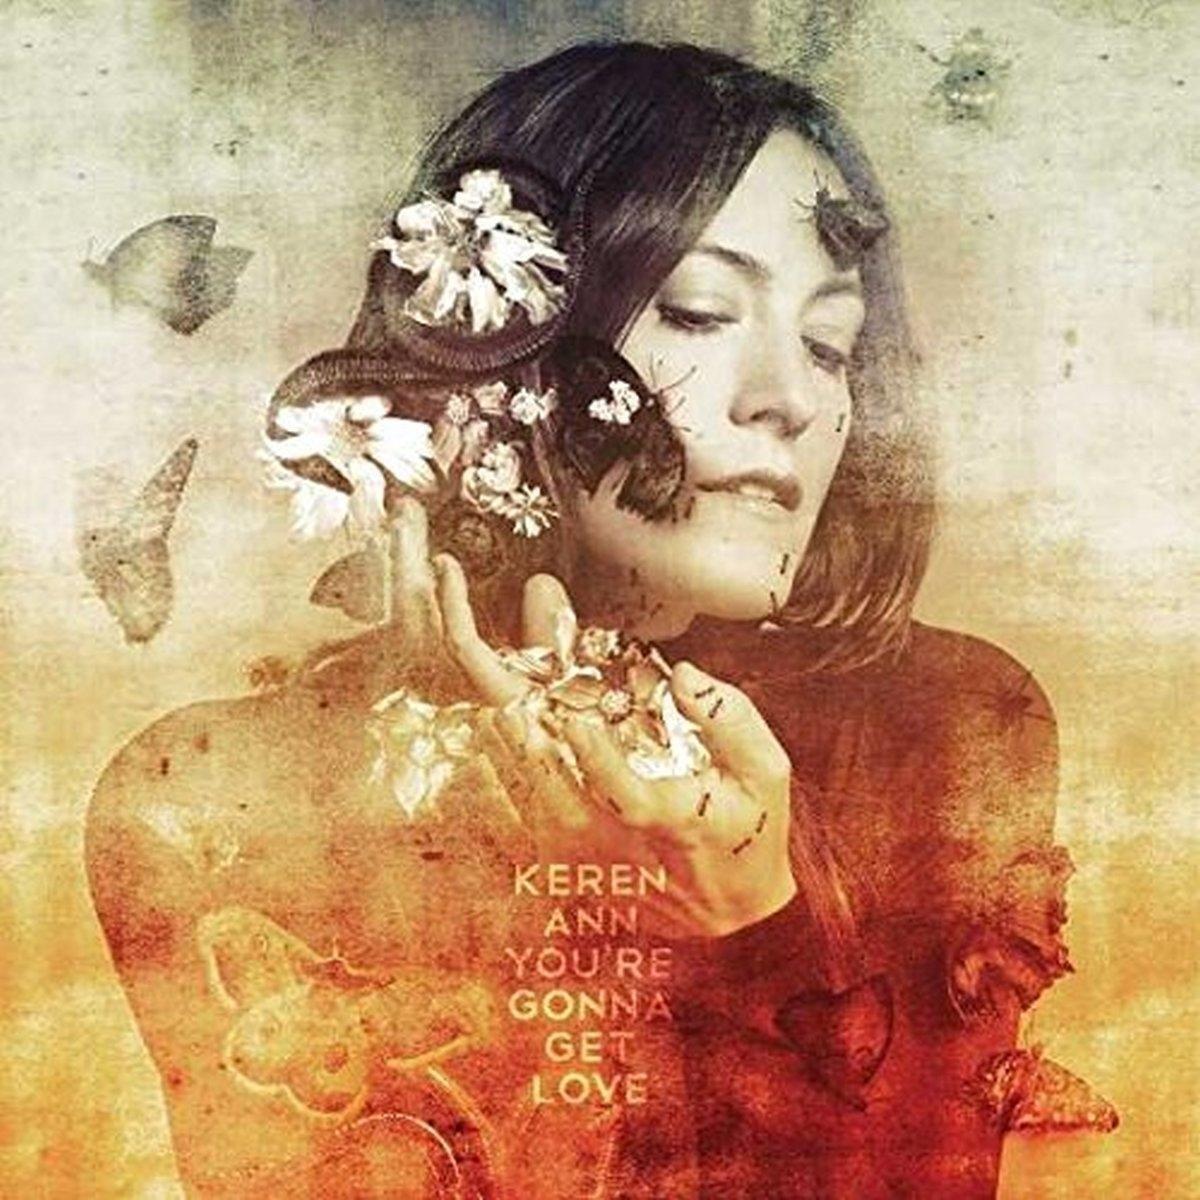 Vinilo : Keren Ann - You're Gonna Get Love (France - Import)